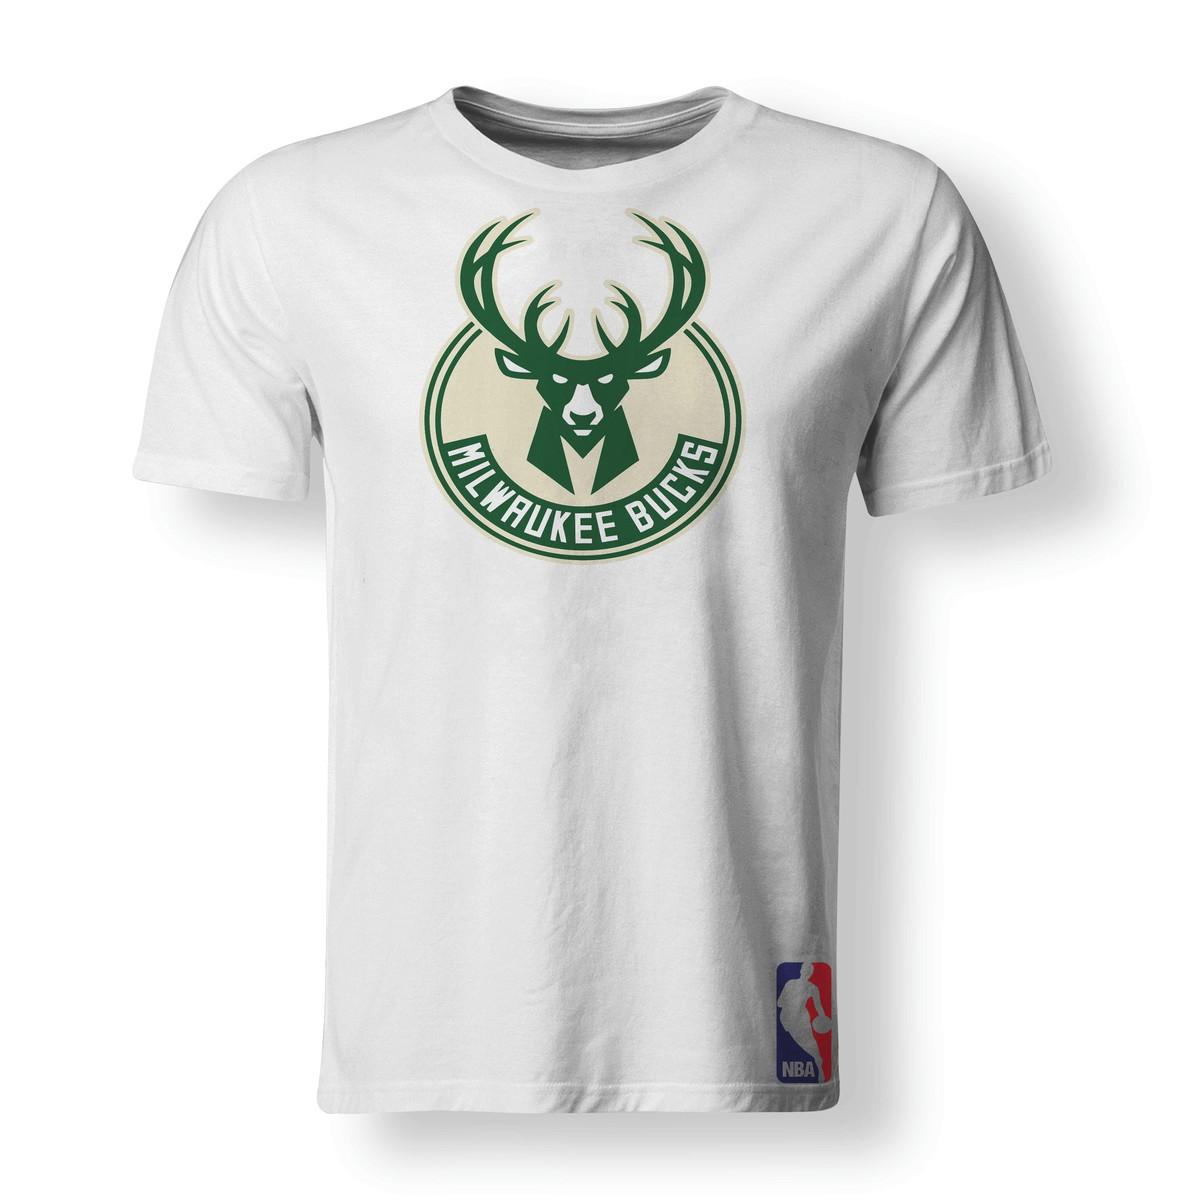 383ede5d3 Camiseta Milwaukee Bucks NBA - A3 no Elo7